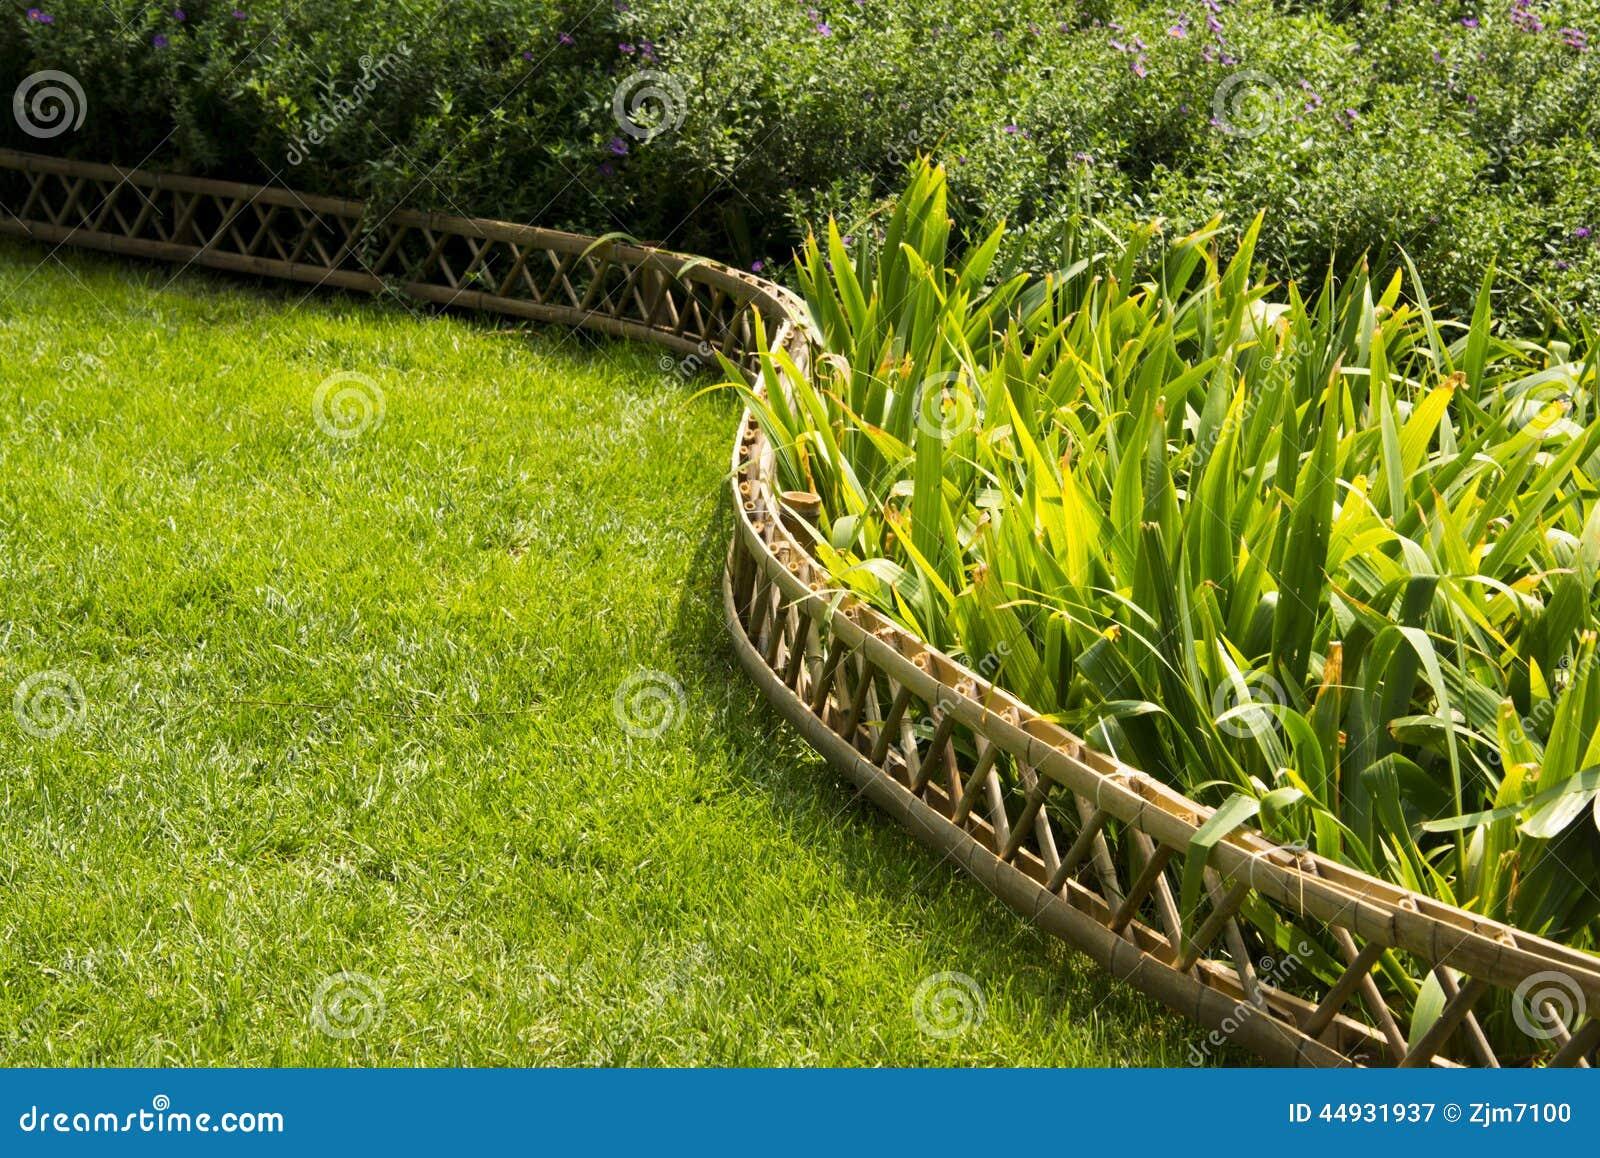 pelouse barri re en bambou photo stock image 44931937. Black Bedroom Furniture Sets. Home Design Ideas